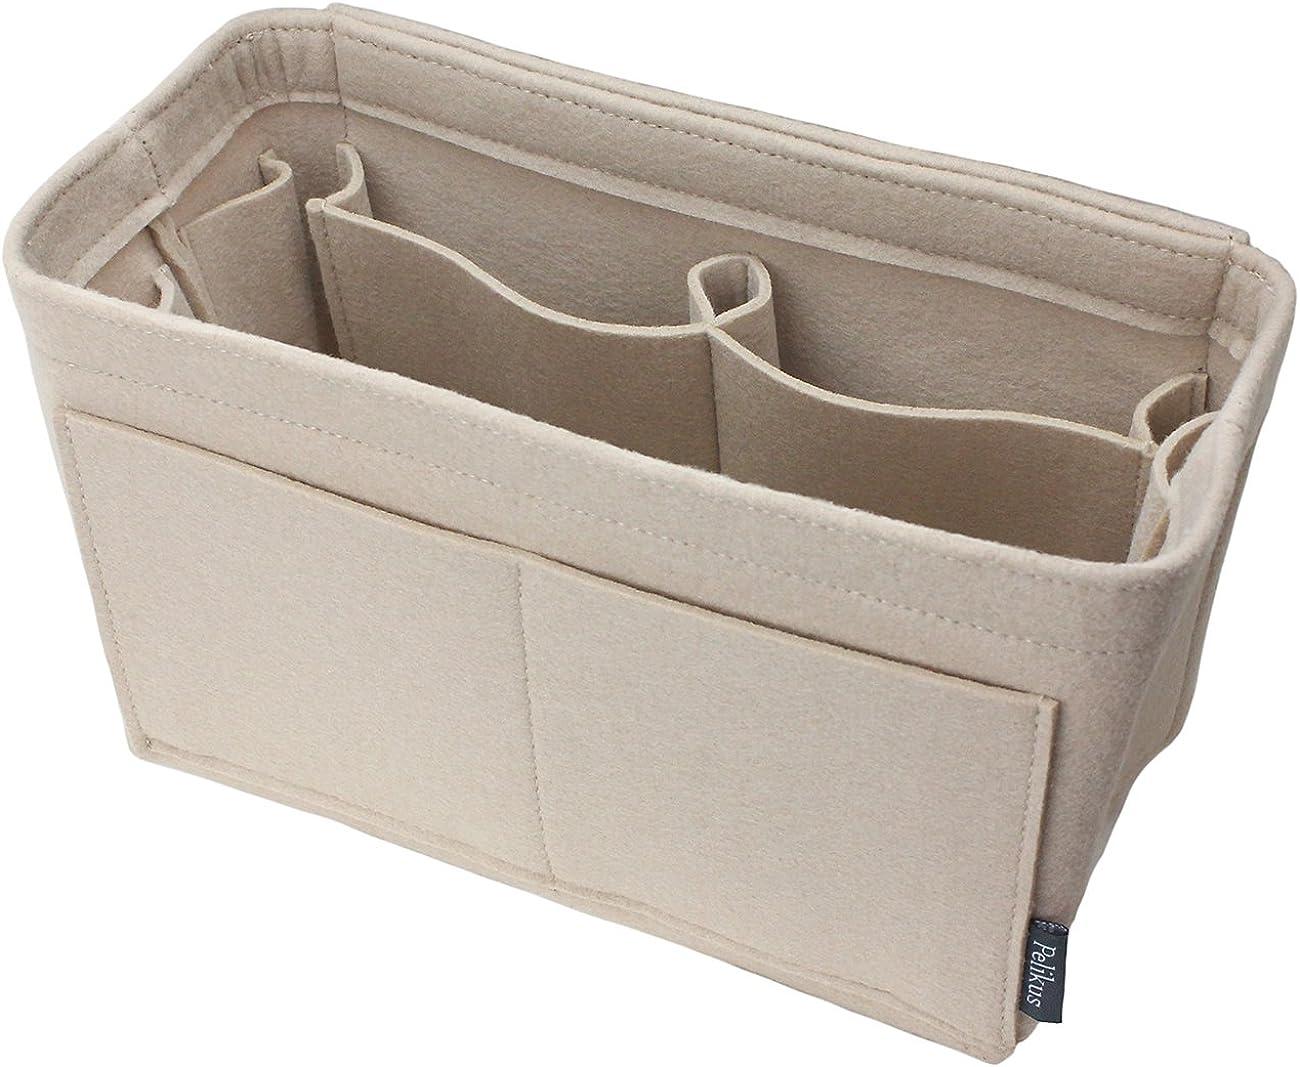 Pelikus Felt Purse and Tote Organiser Insert – Multi-Pocket Handbag Shaper